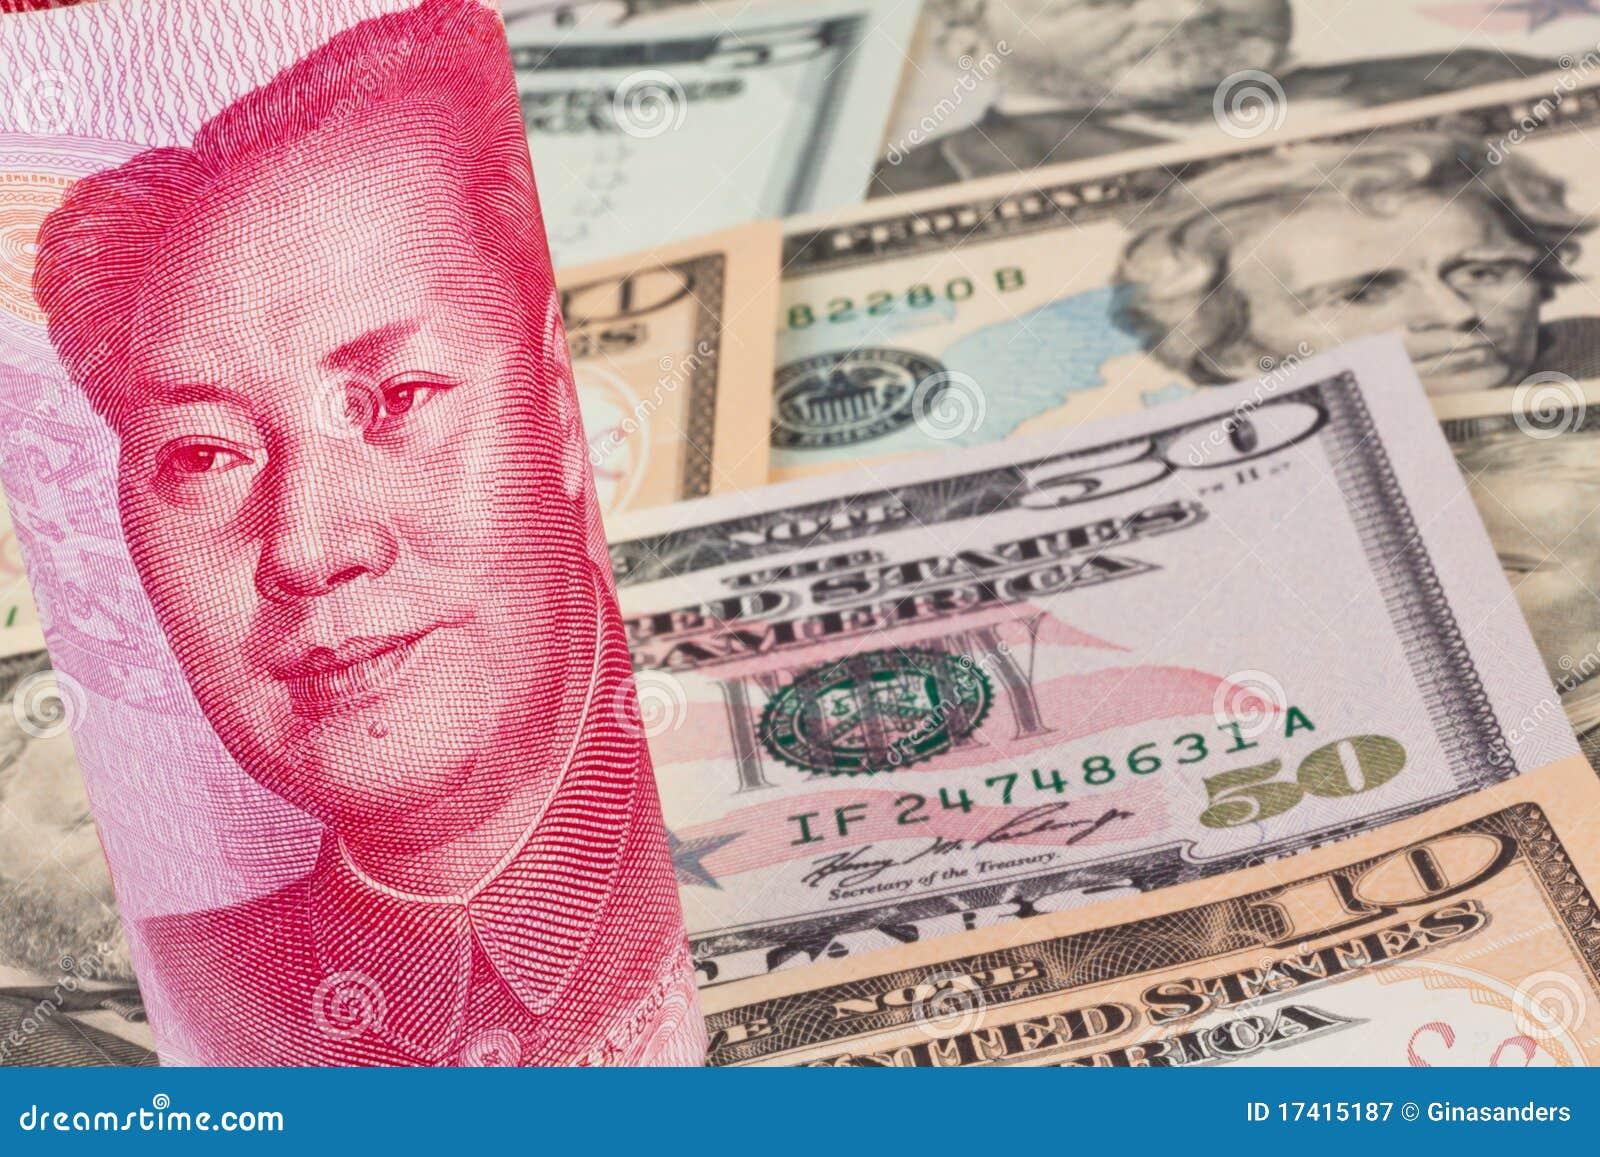 Yuan currency symbol